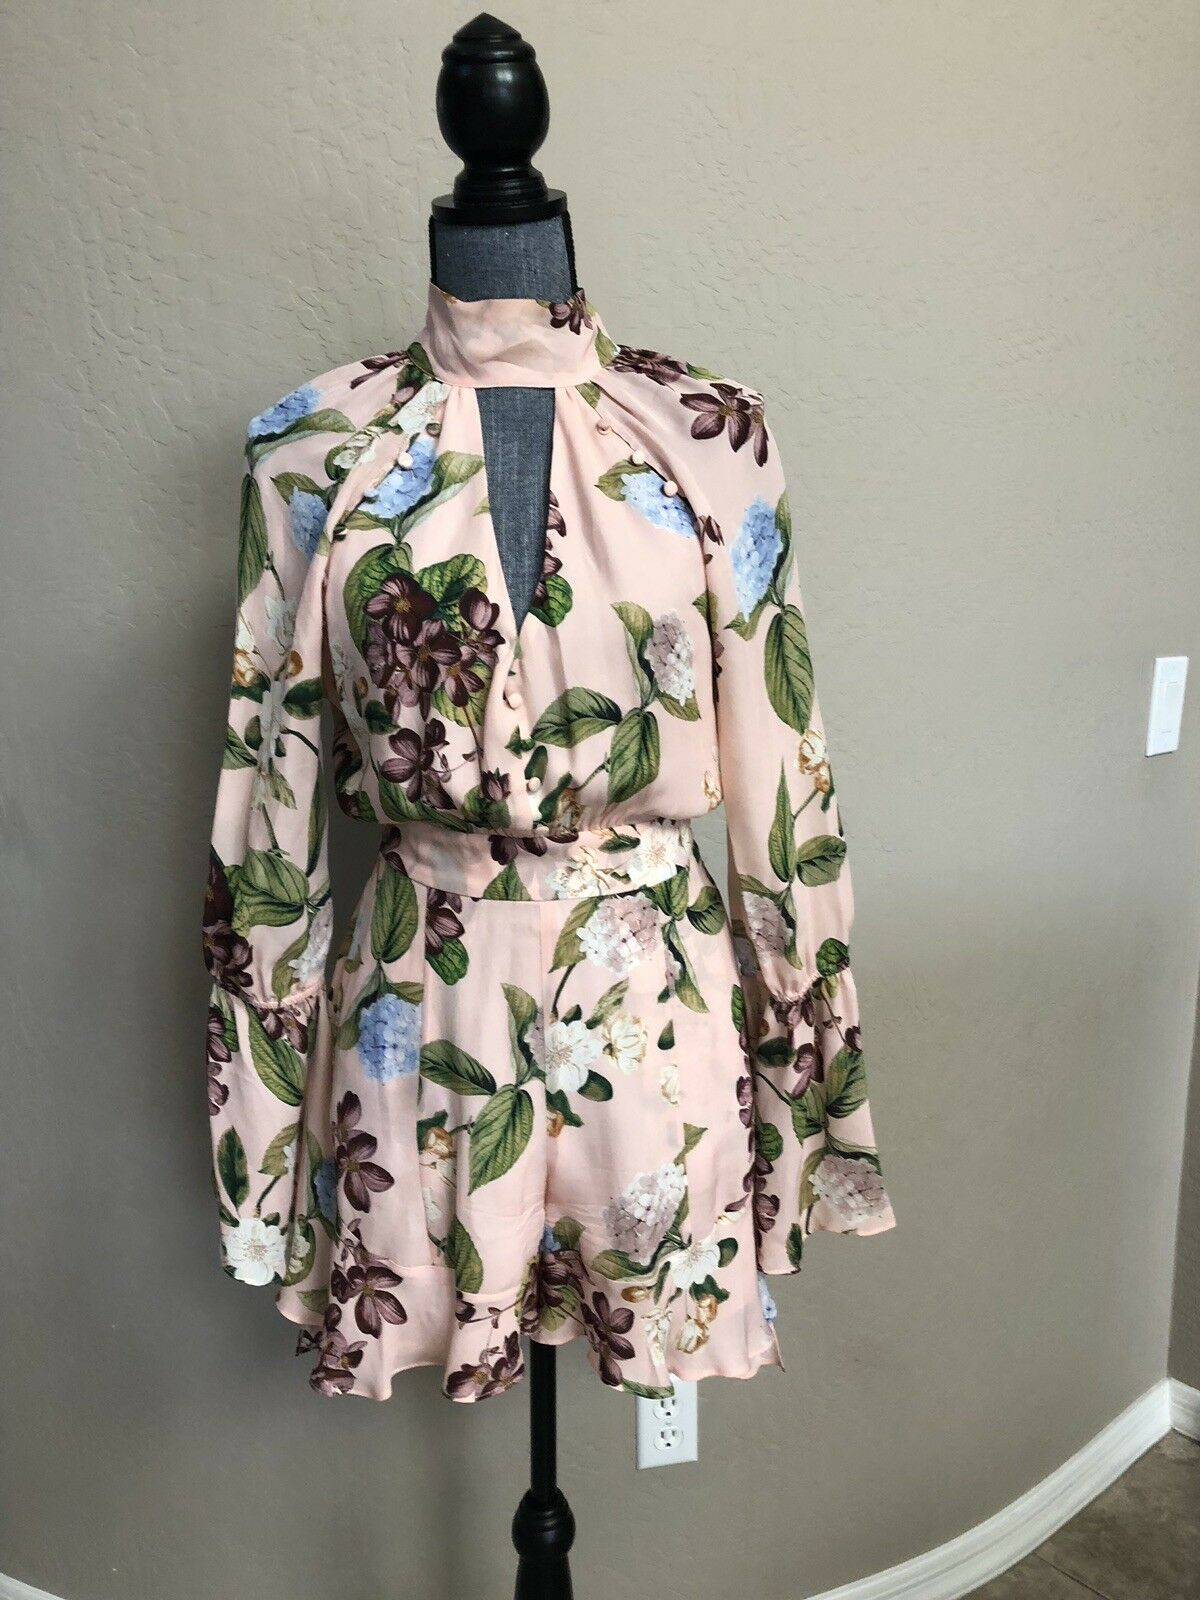 Nicholas  Ruffled Romper Dress Size XS US 0-2 Pink Floral Print Tropical